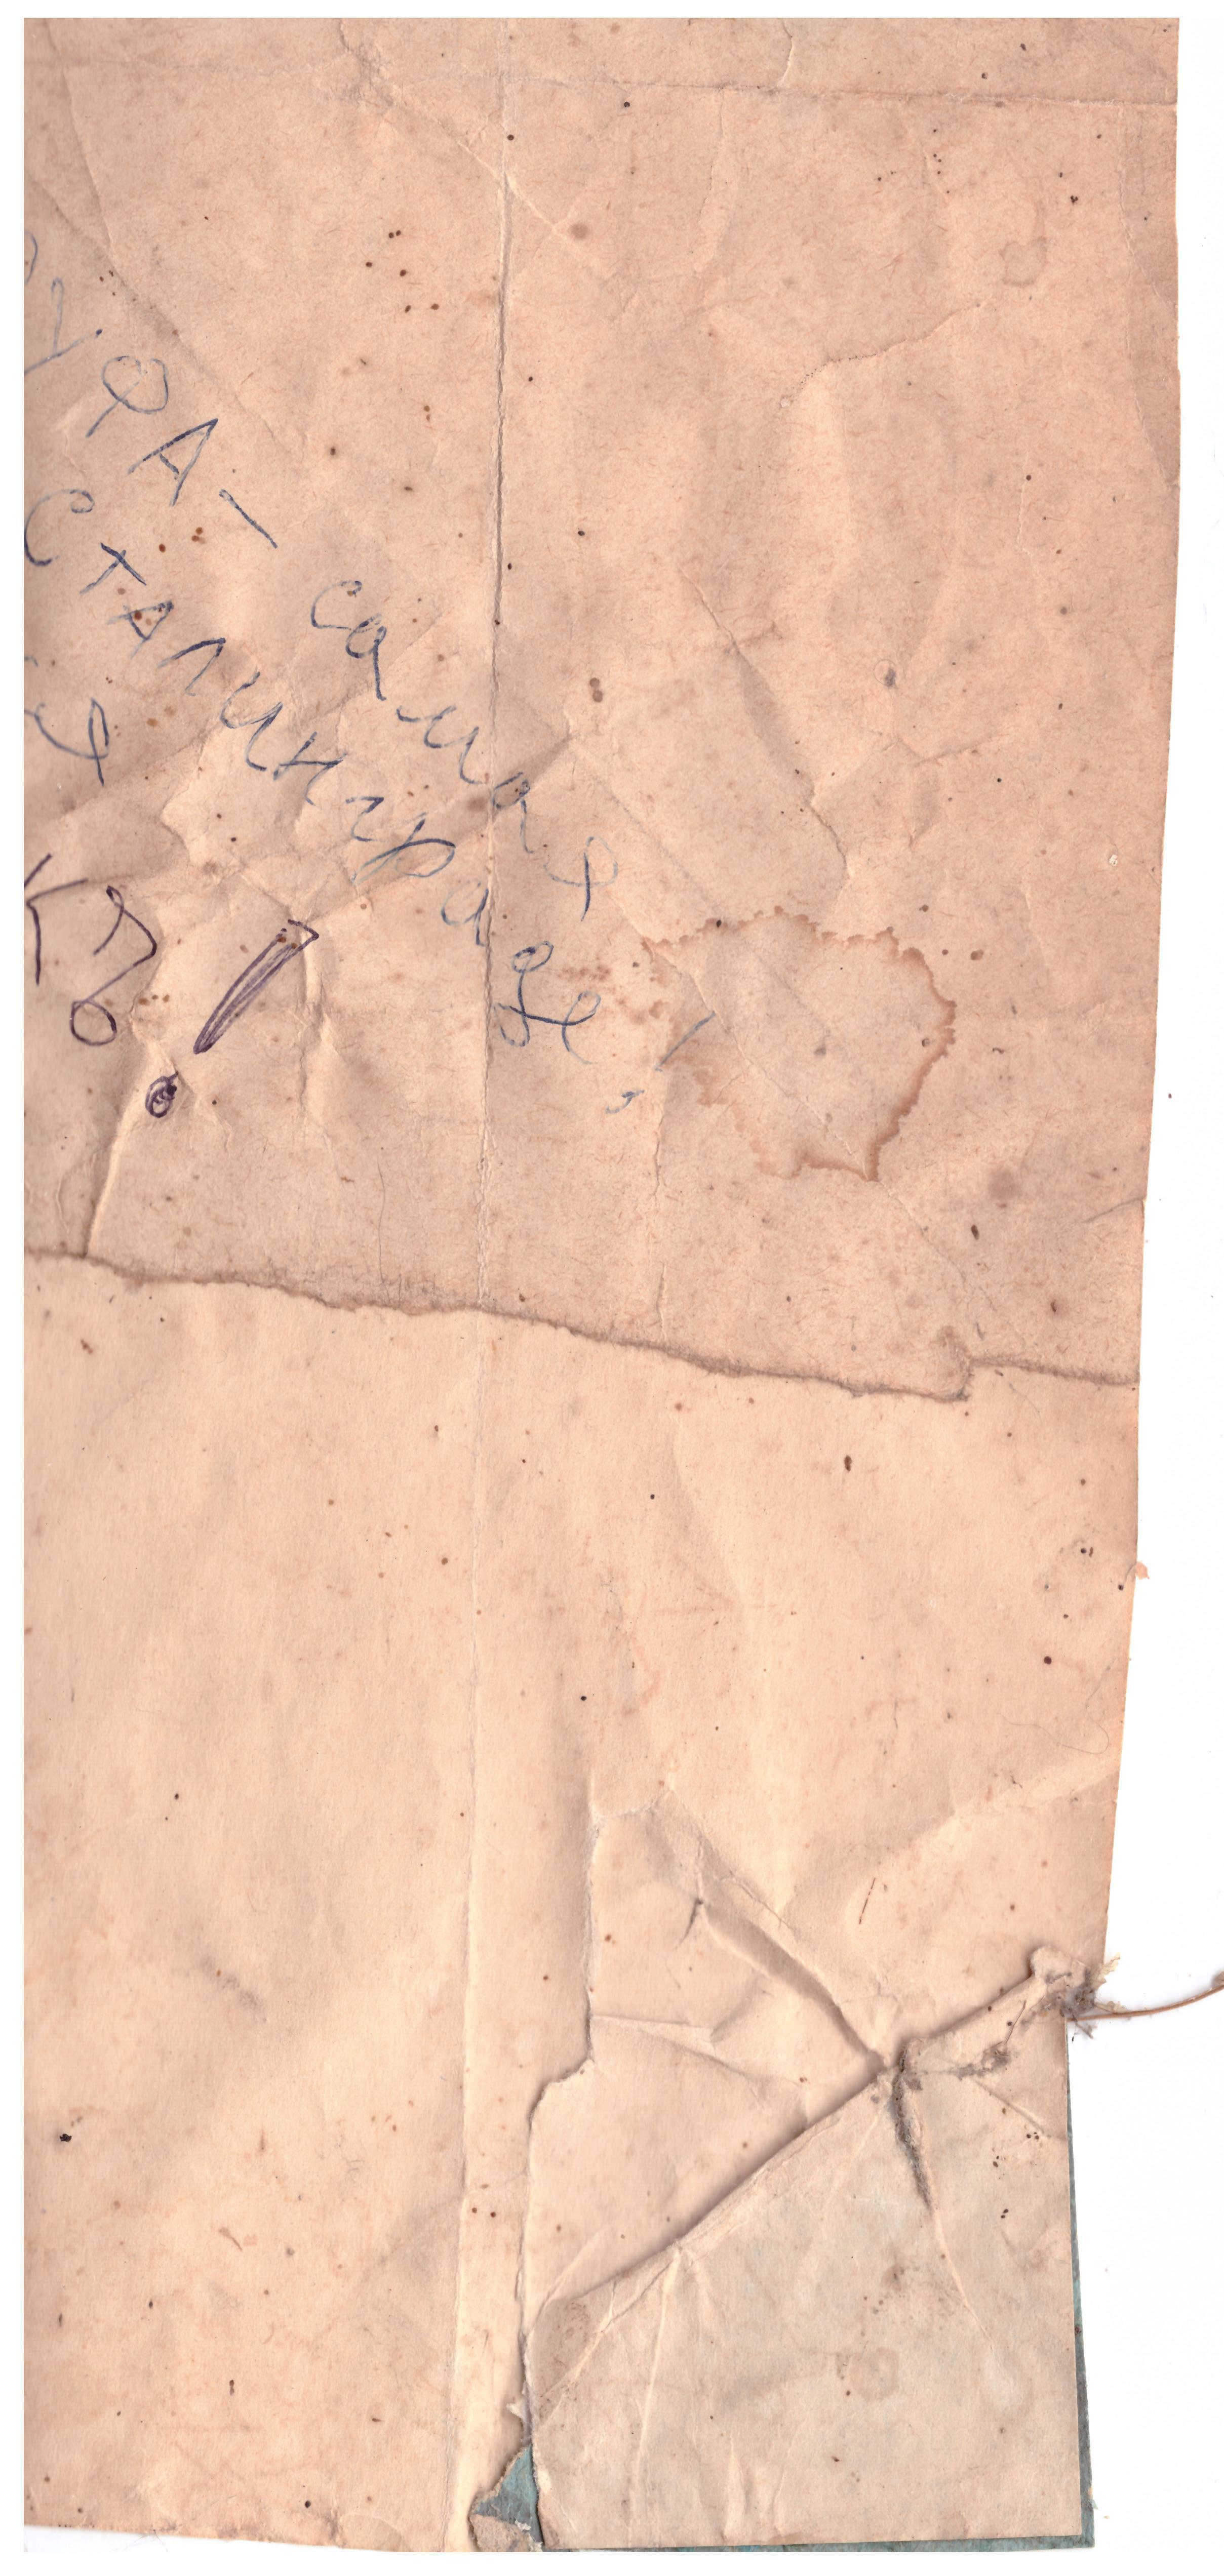 008 н.jpg